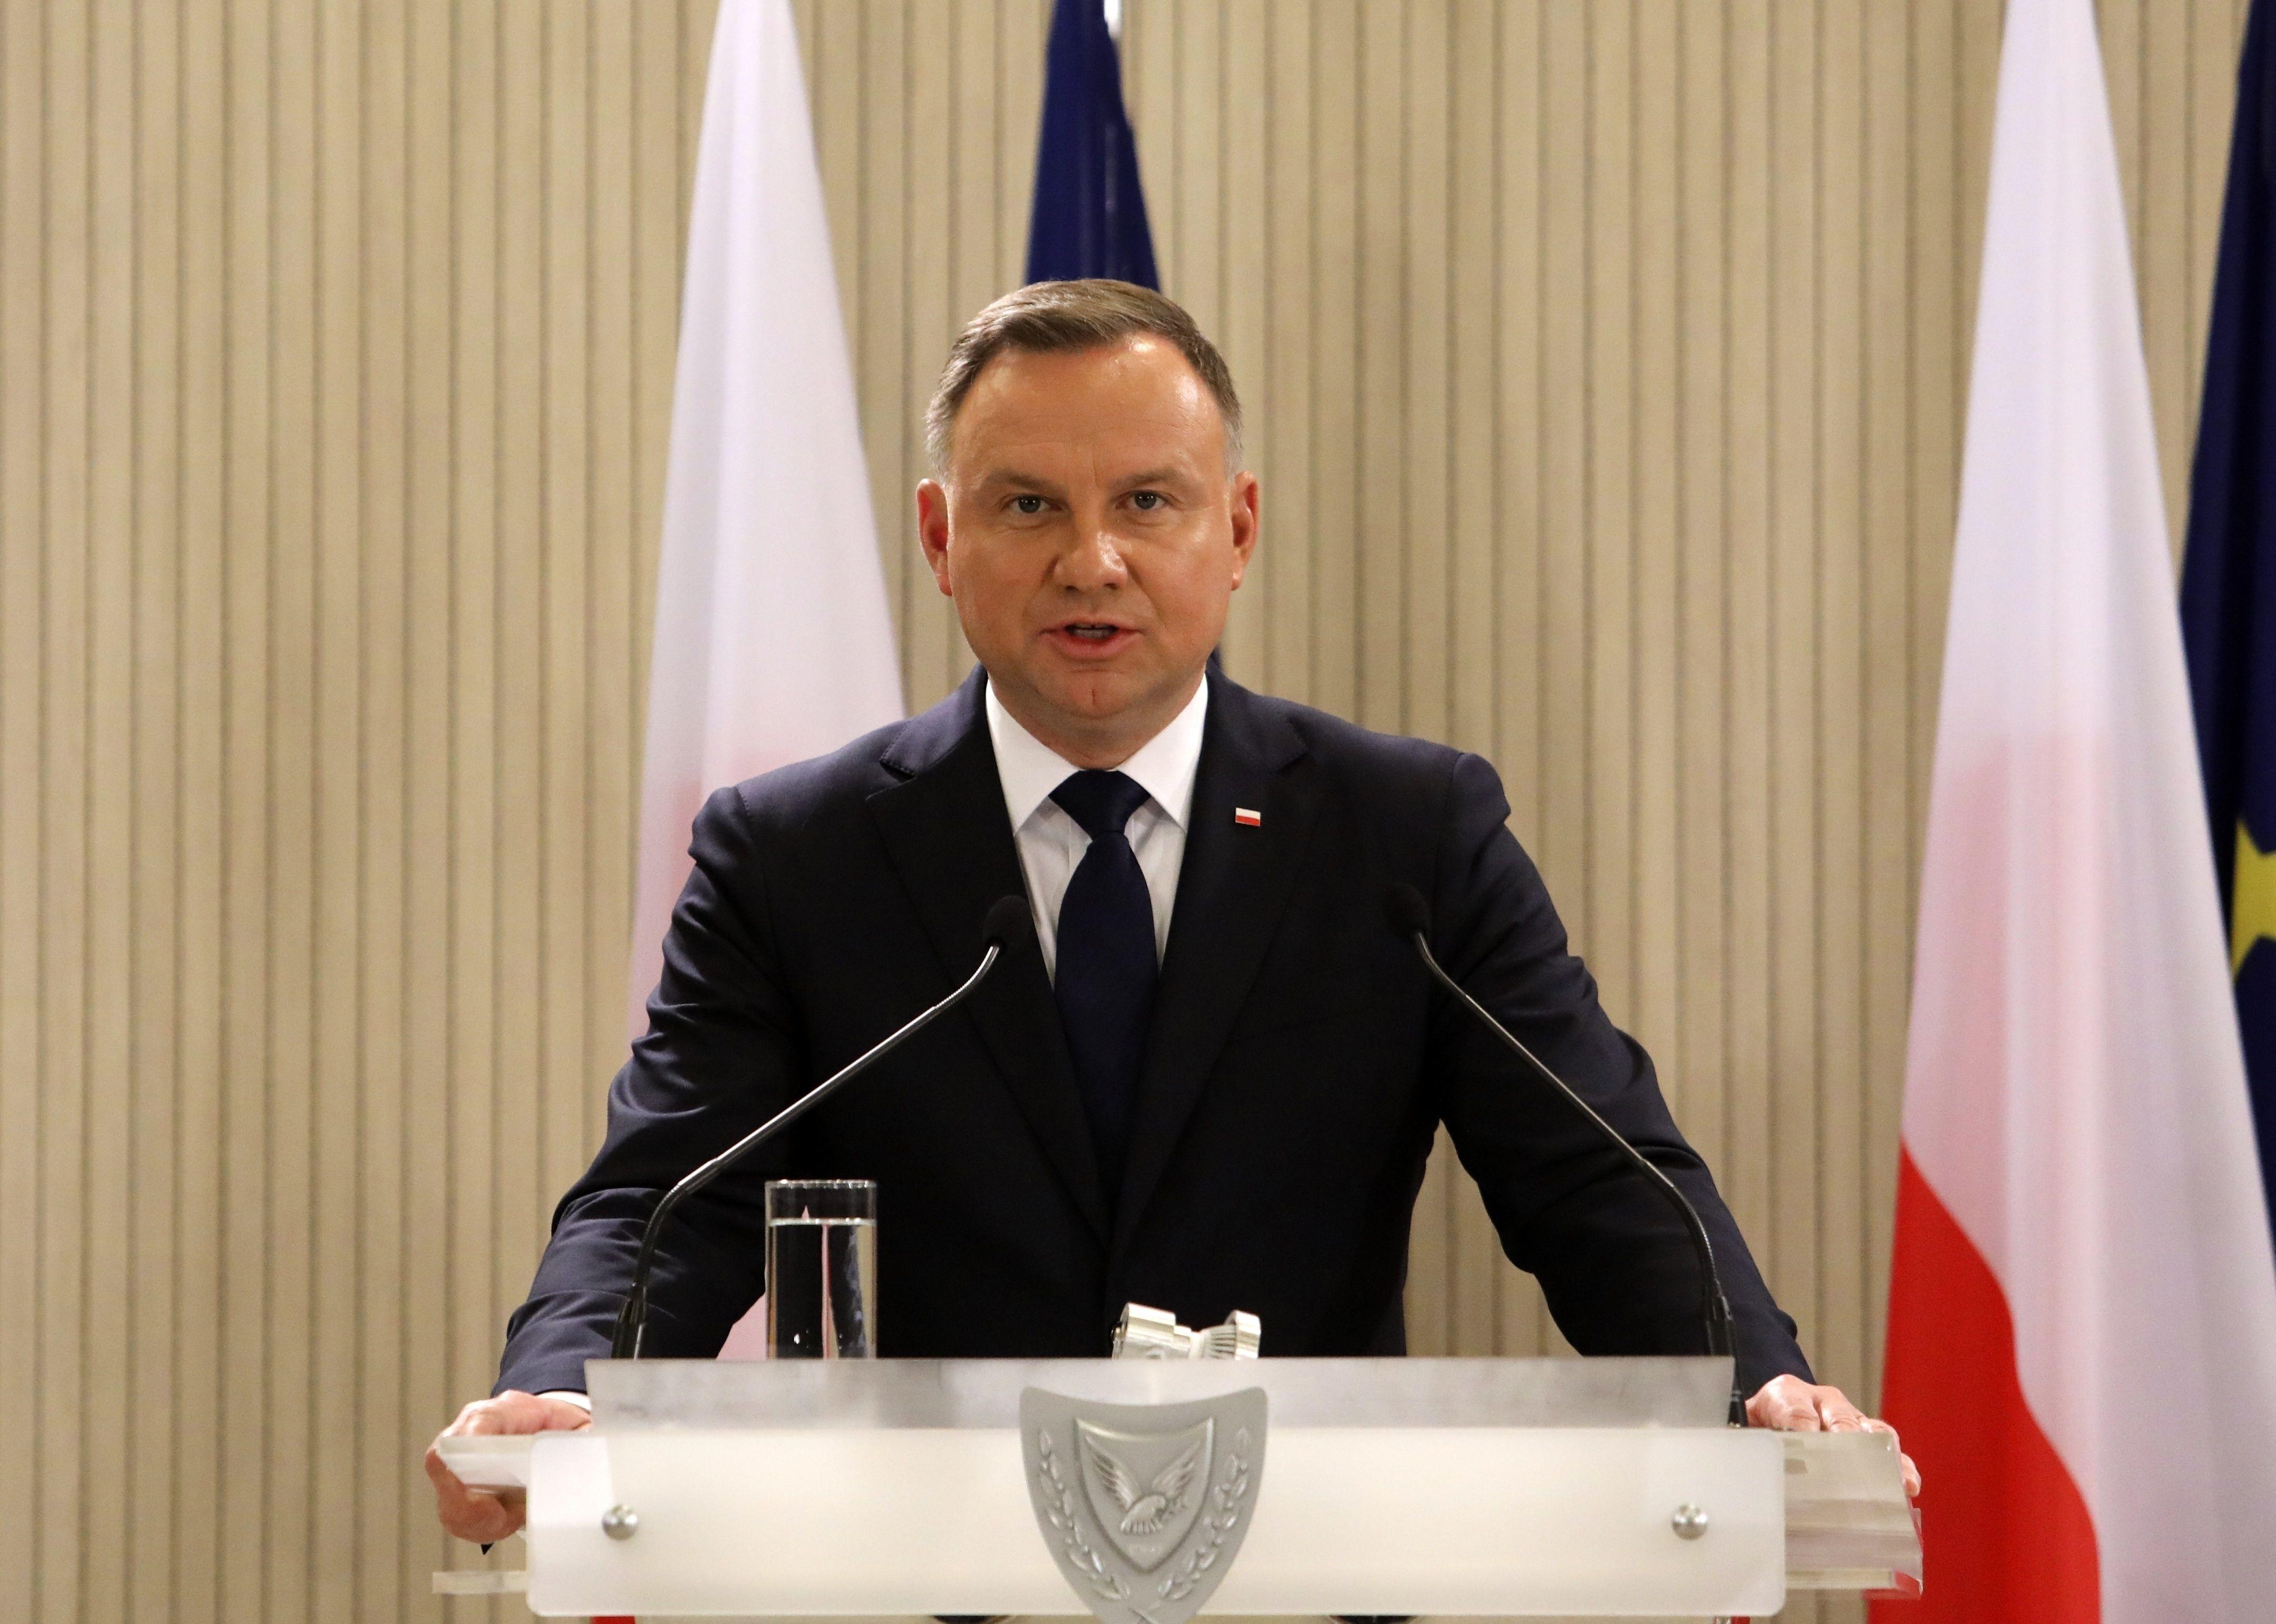 polonia pide a ue frenar medidas migratorias de bielorrusia